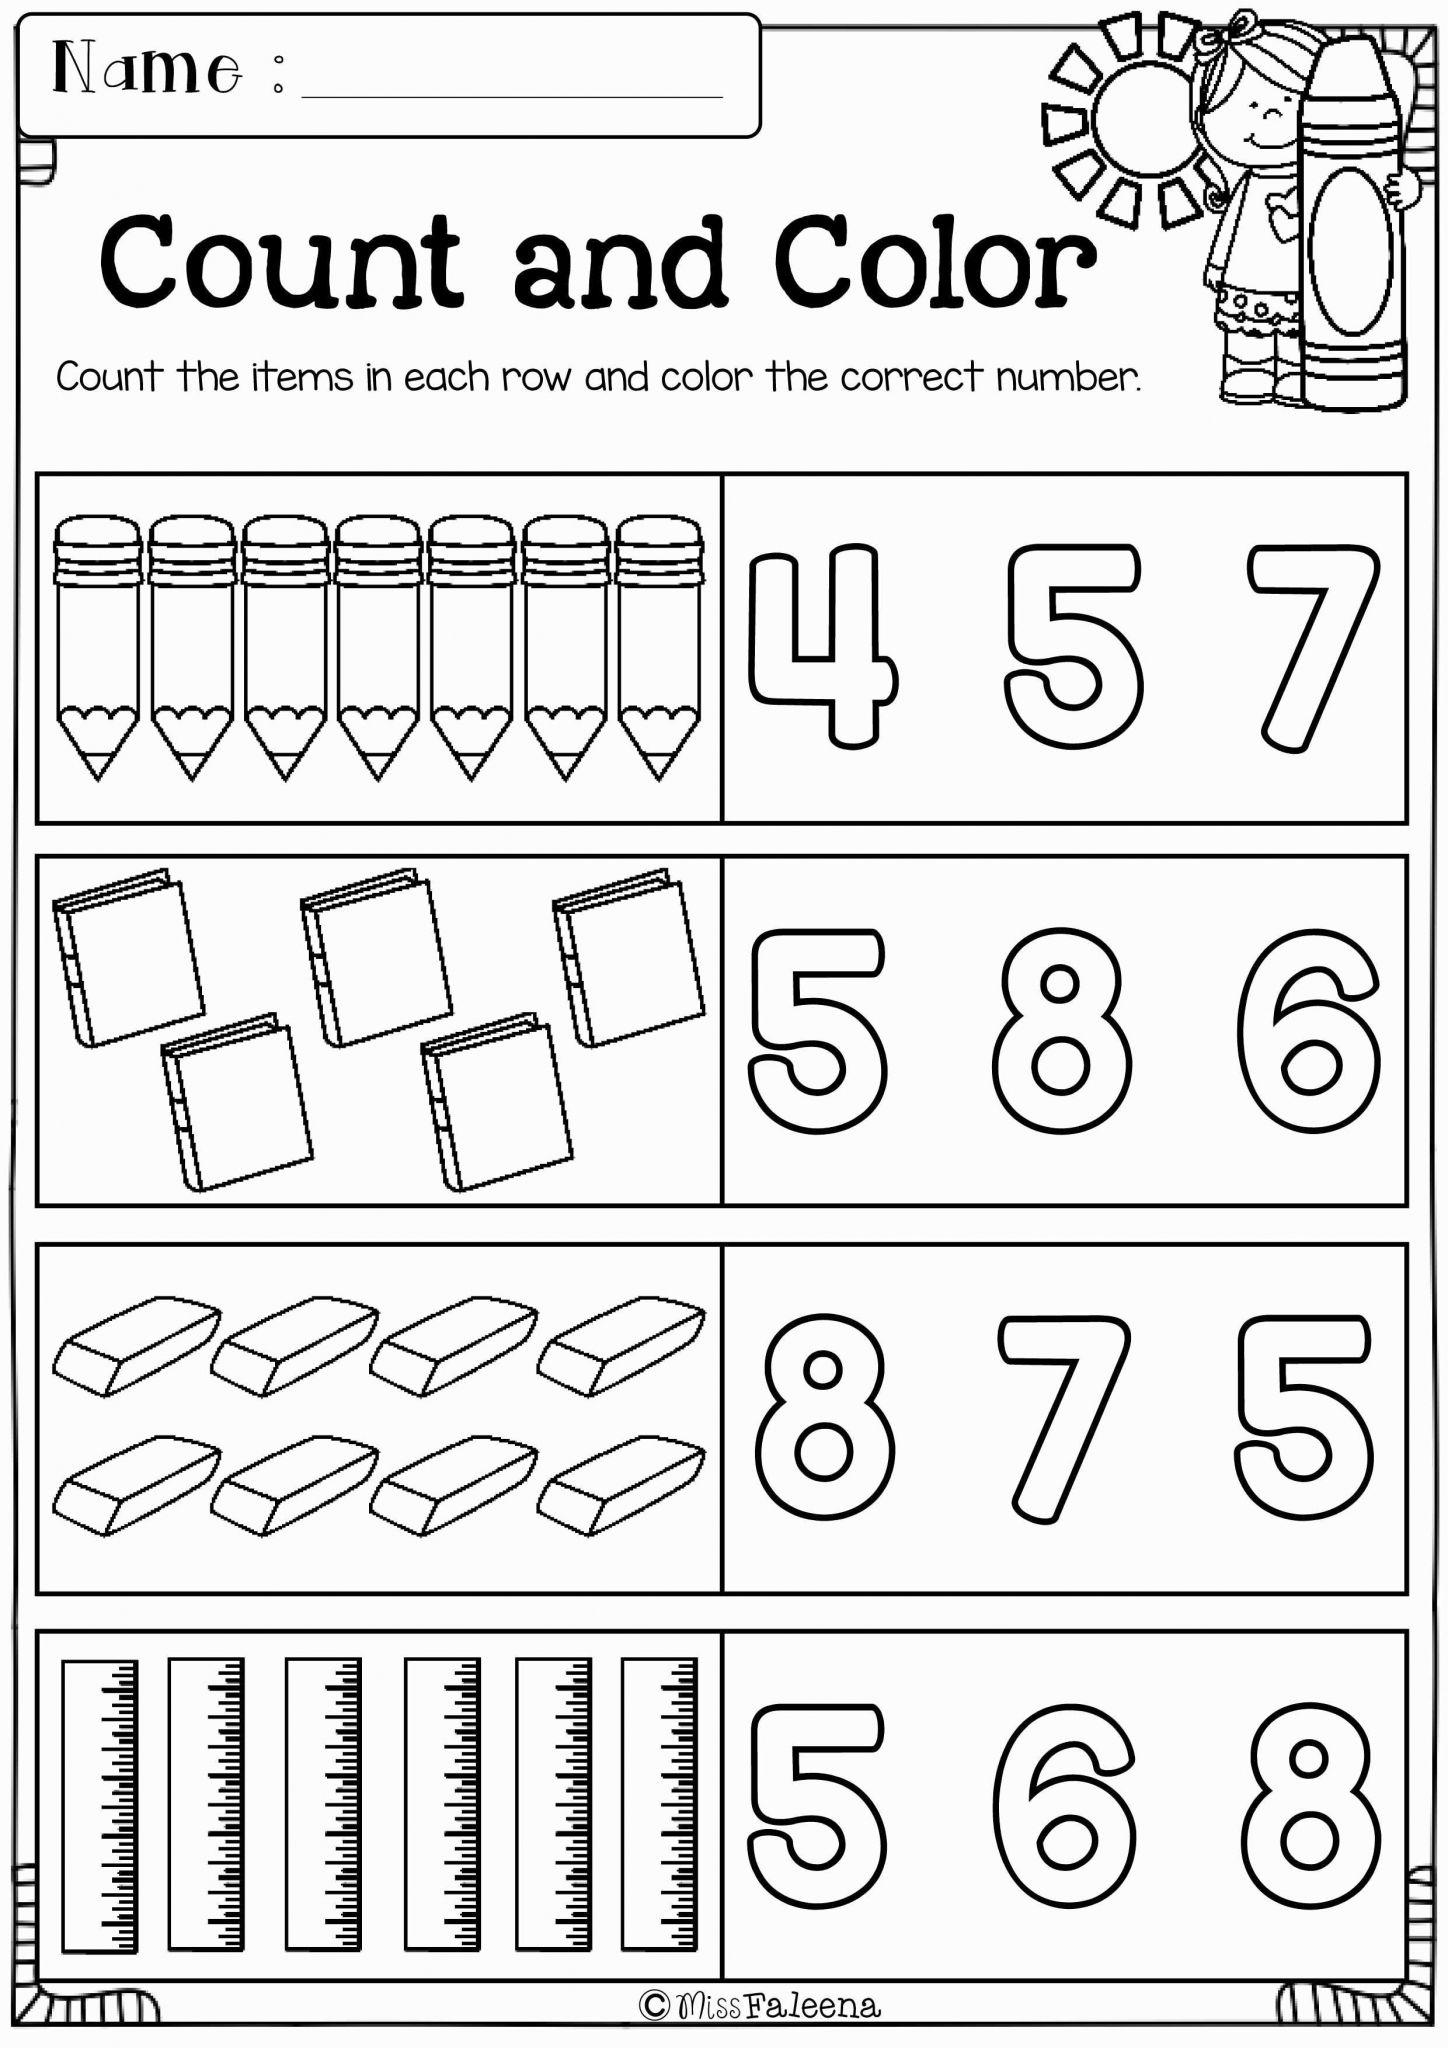 Cbt Worksheets For Children